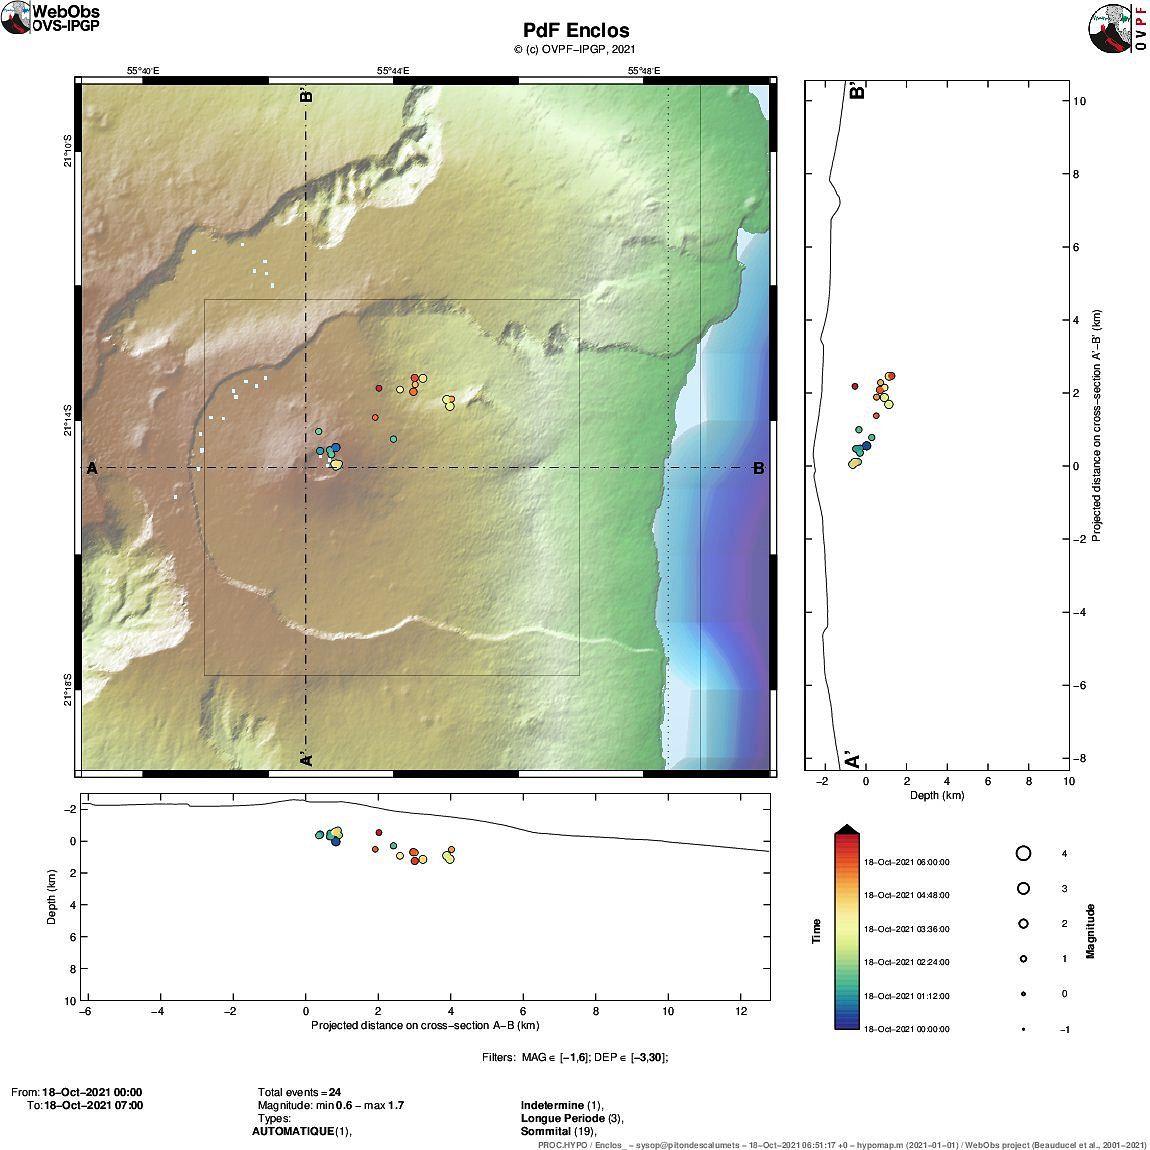 Piton de La Fournaise - location of the earthquakes in progress on October 18, 2021 - Doc. OVPF